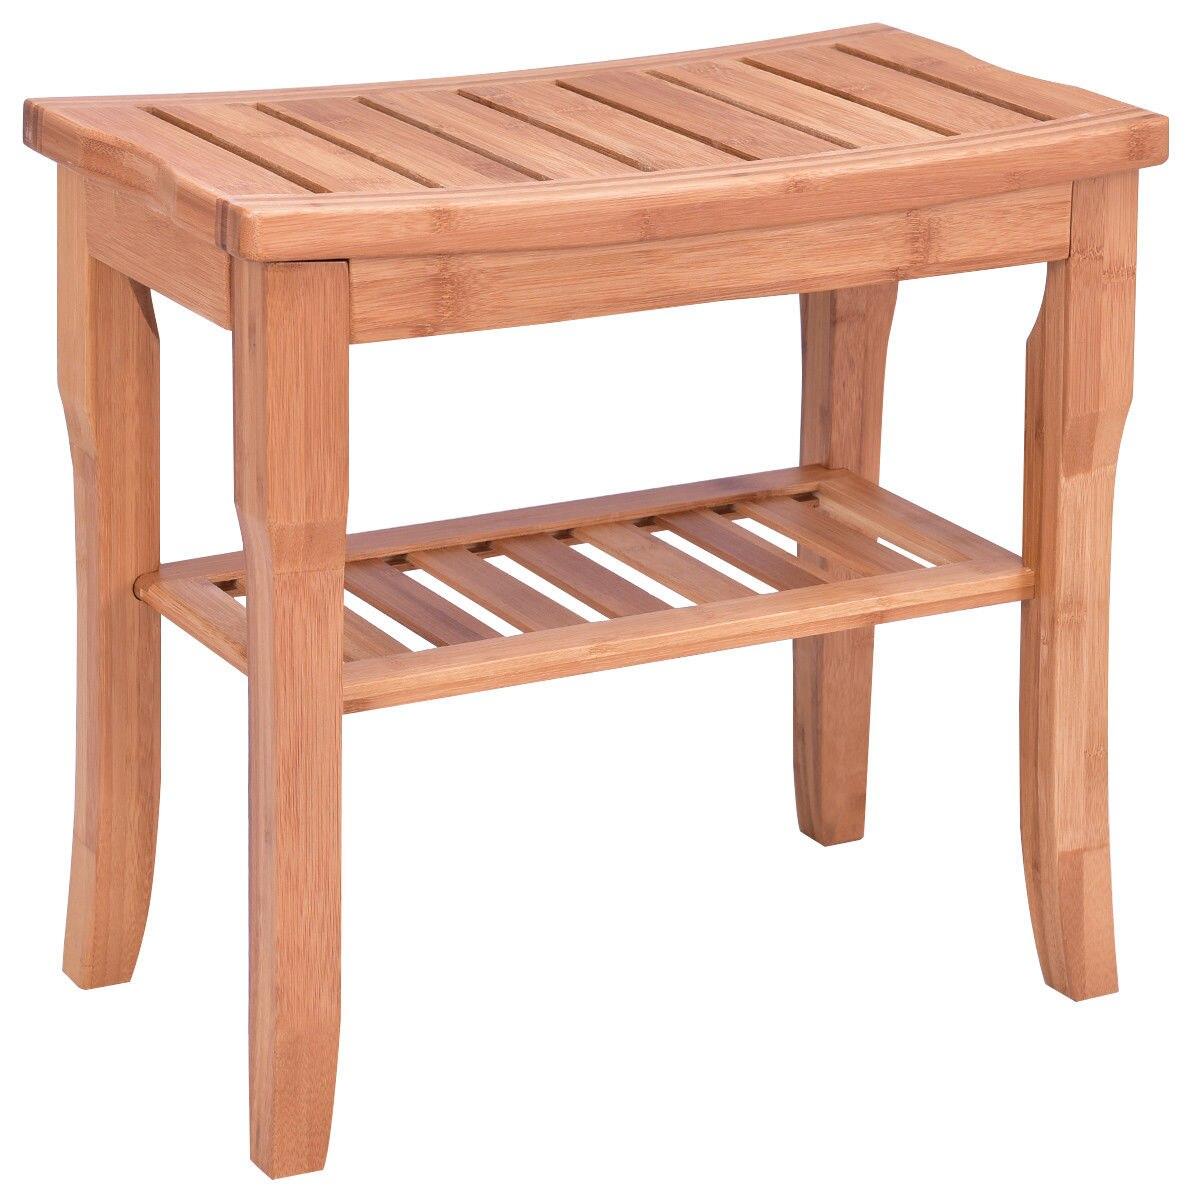 Giantex الخيزران كرسي استحمام مقعد مقعد الحديثة الخشب الحمام سبا حمام المنظم البراز مع تخزين الرف BA7268